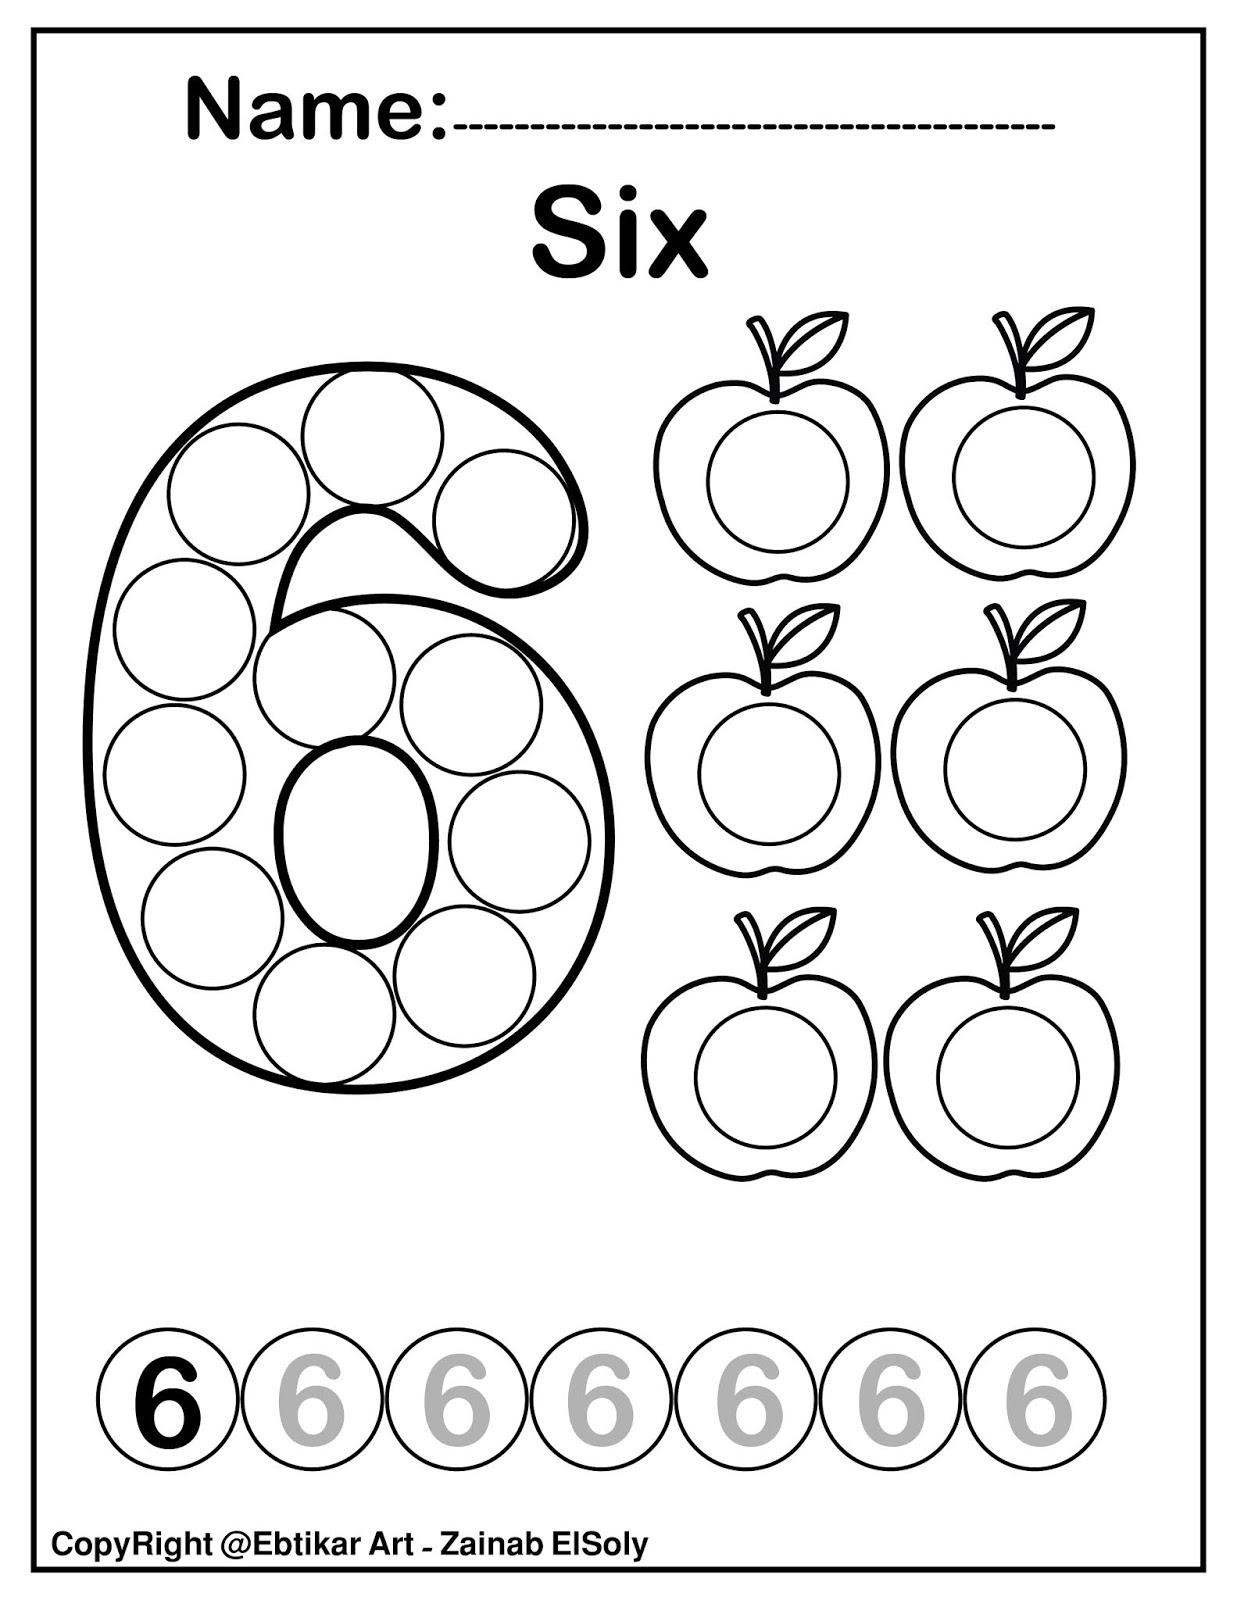 Coloring Pages Worksheets Free Printable Kindergarten Math